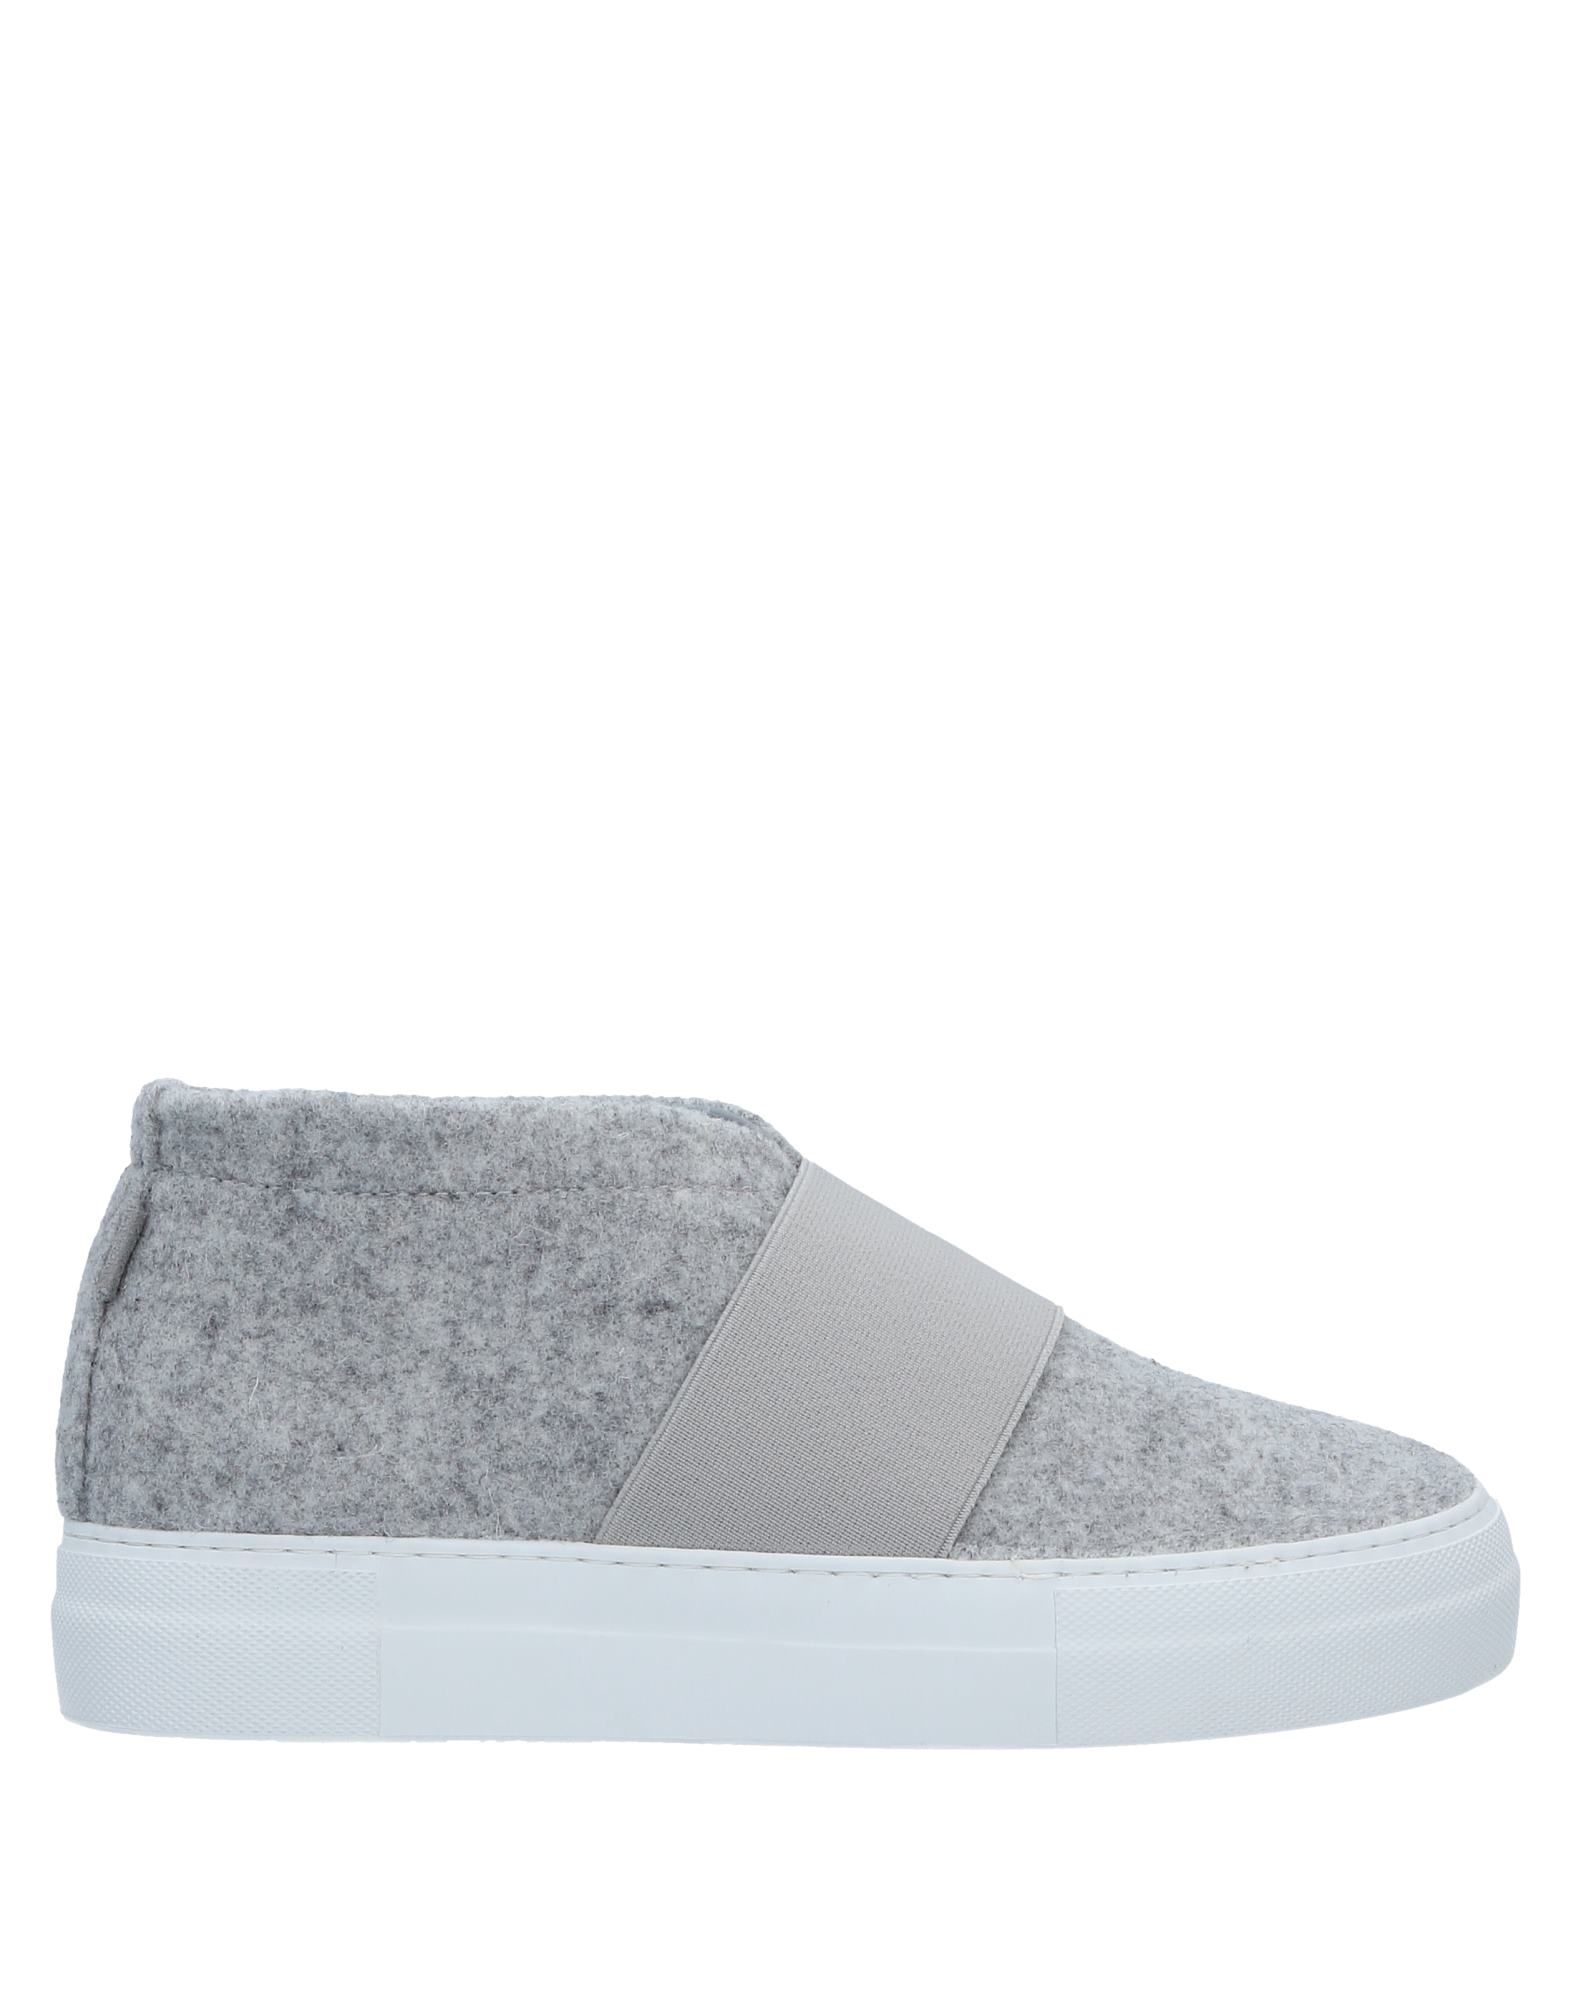 Moda Sneakers Diemme Donna - 11500613BX